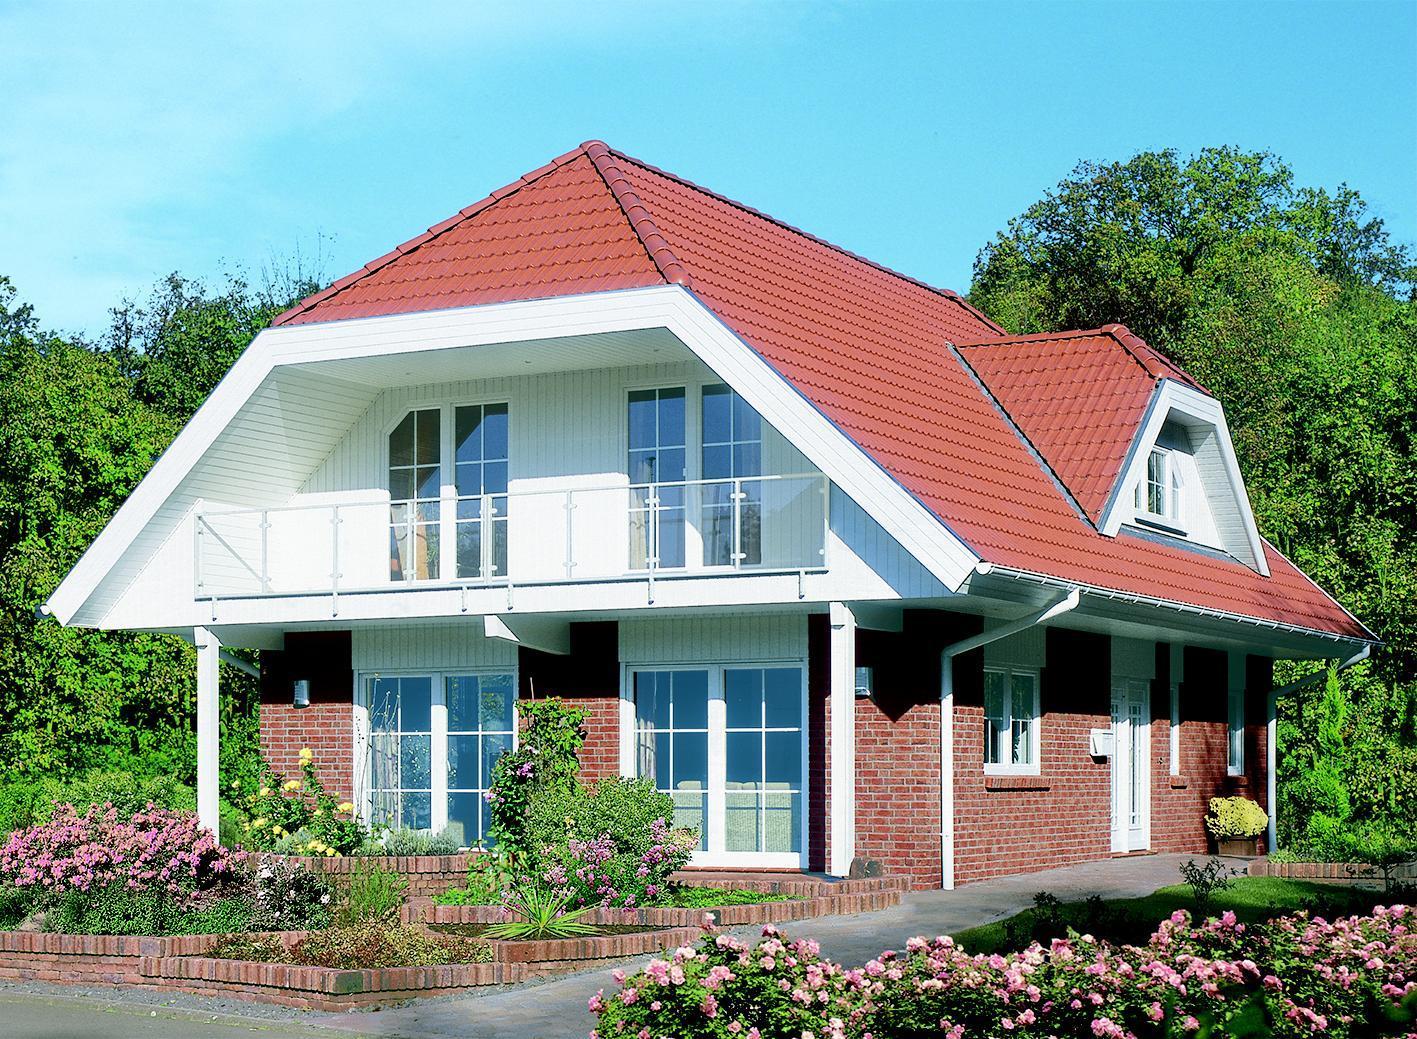 danhaus das 1liter haus in frankfurt bauunternehmen in bad vilbel ludwig erhard stra e 66. Black Bedroom Furniture Sets. Home Design Ideas